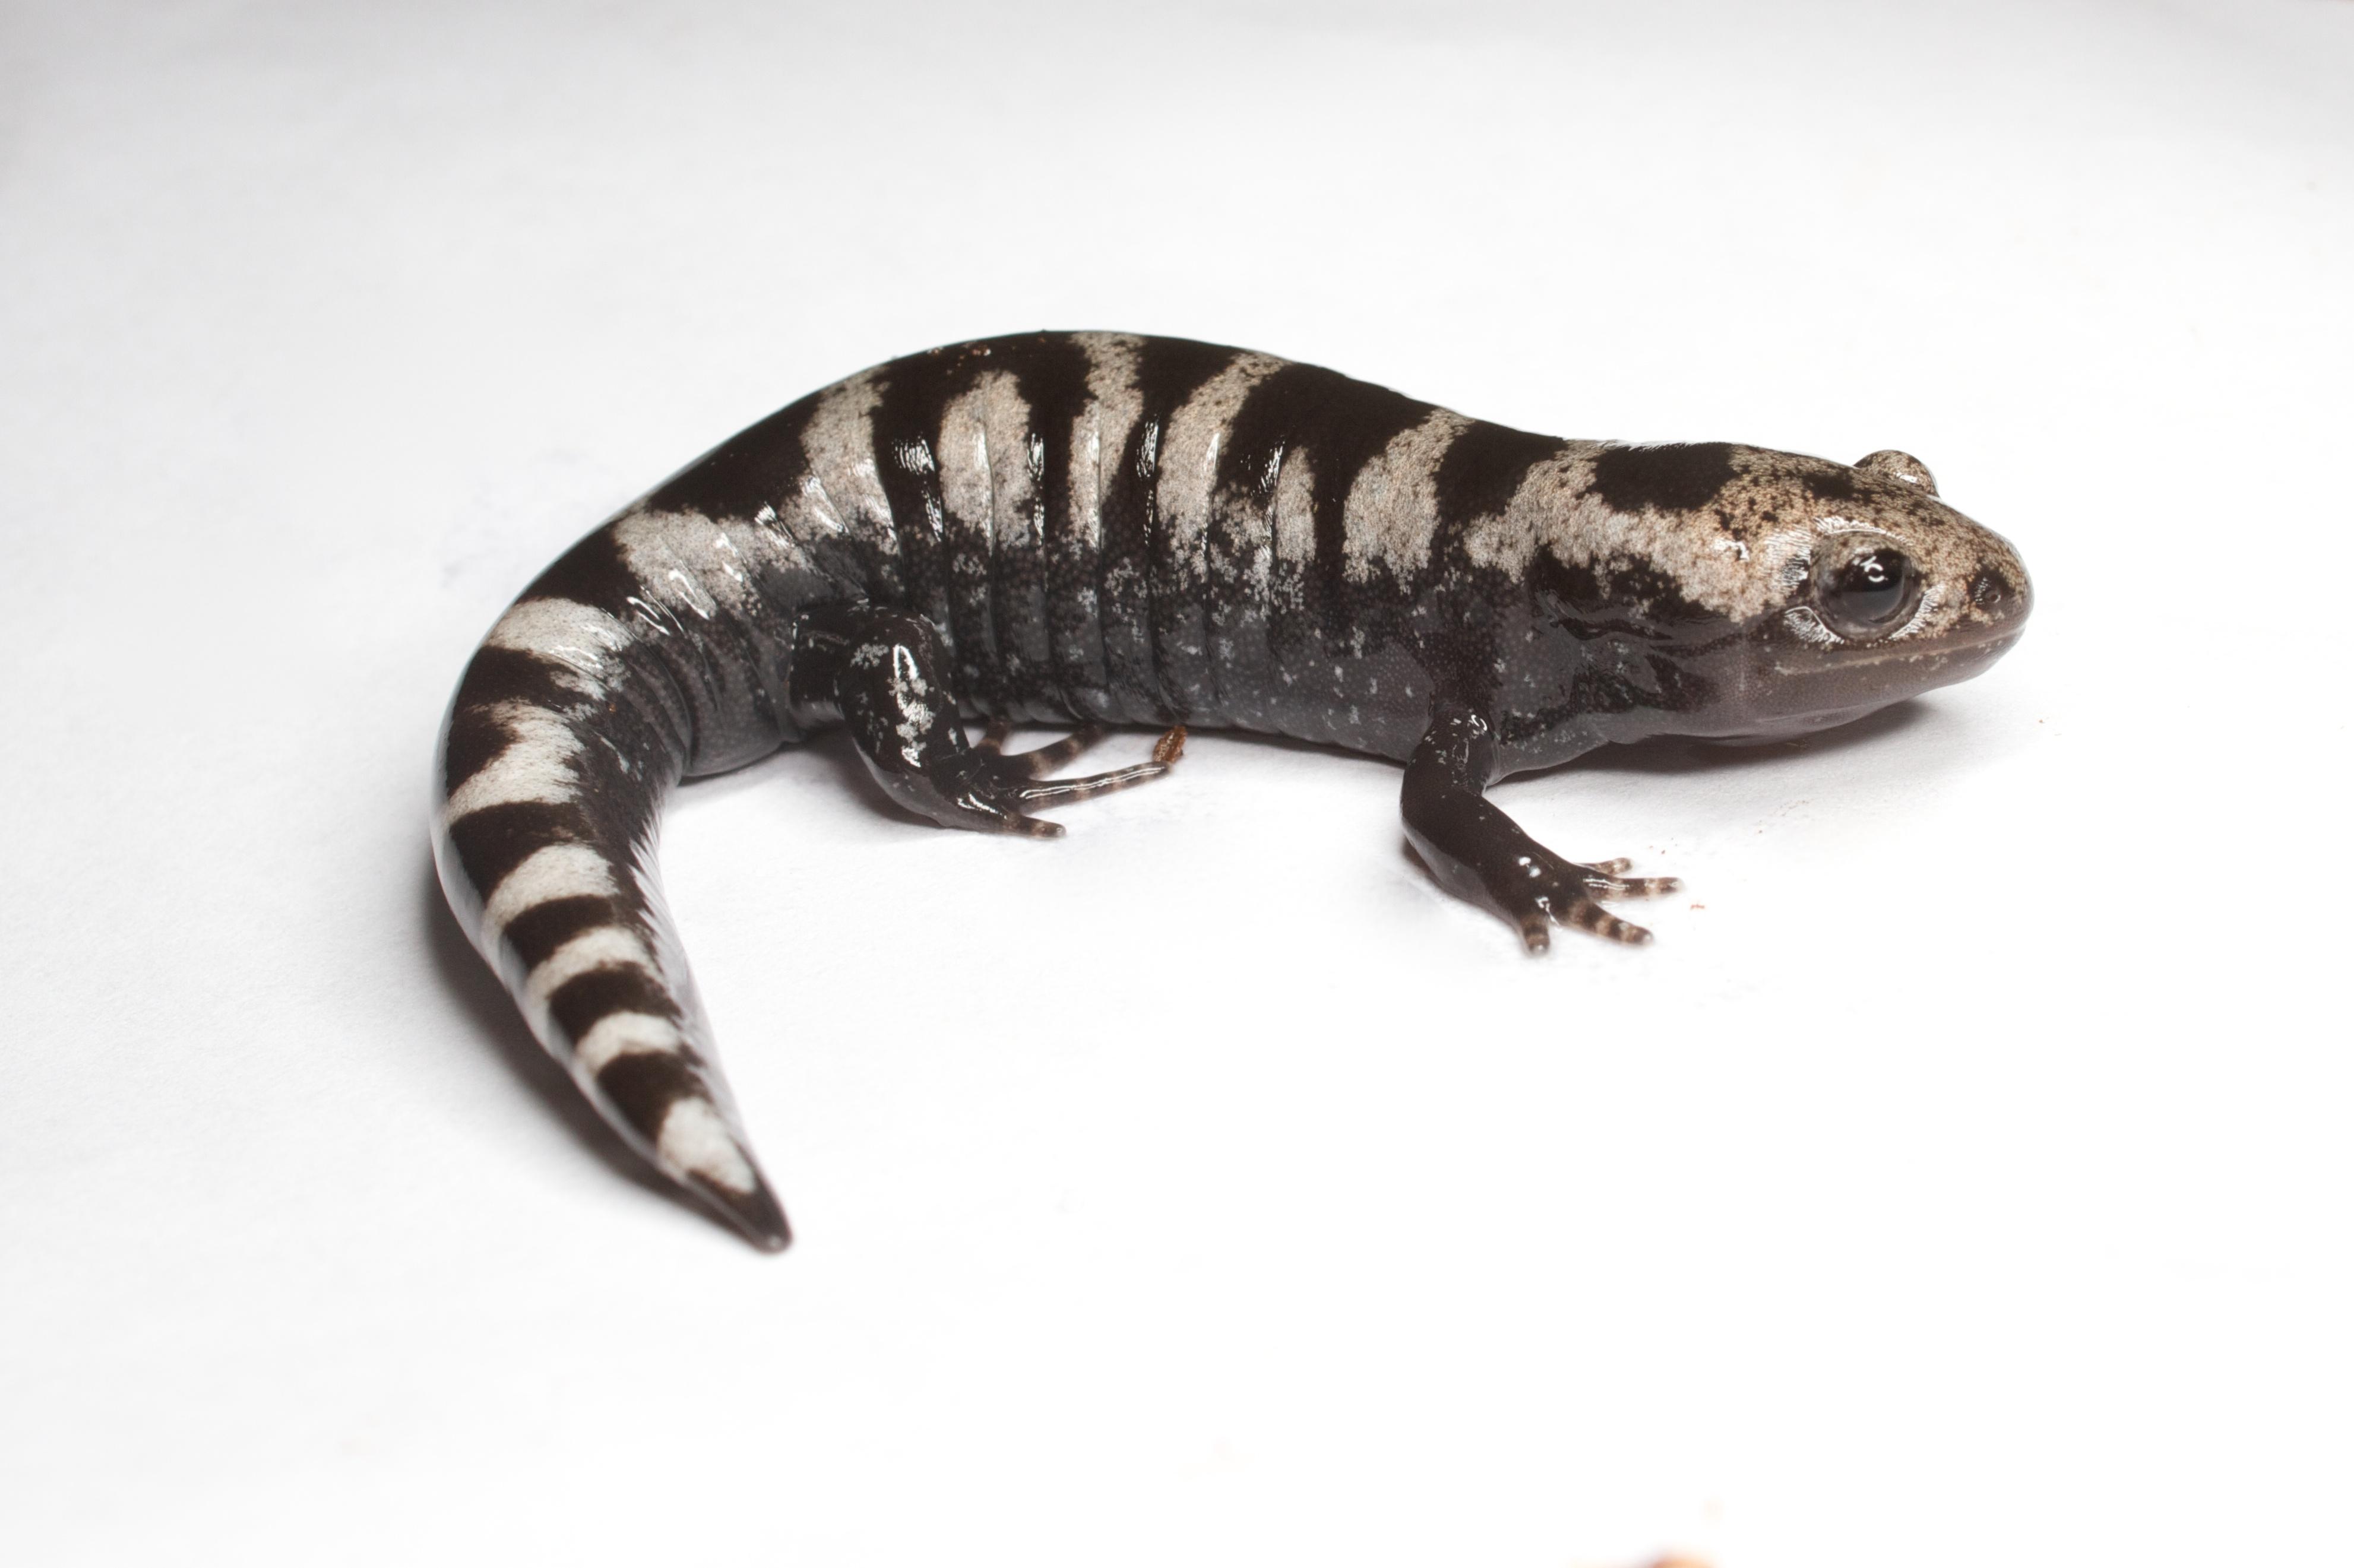 https://upload.wikimedia.org/wikipedia/commons/7/73/Marbled_salamander_%2814367751333%29.jpg